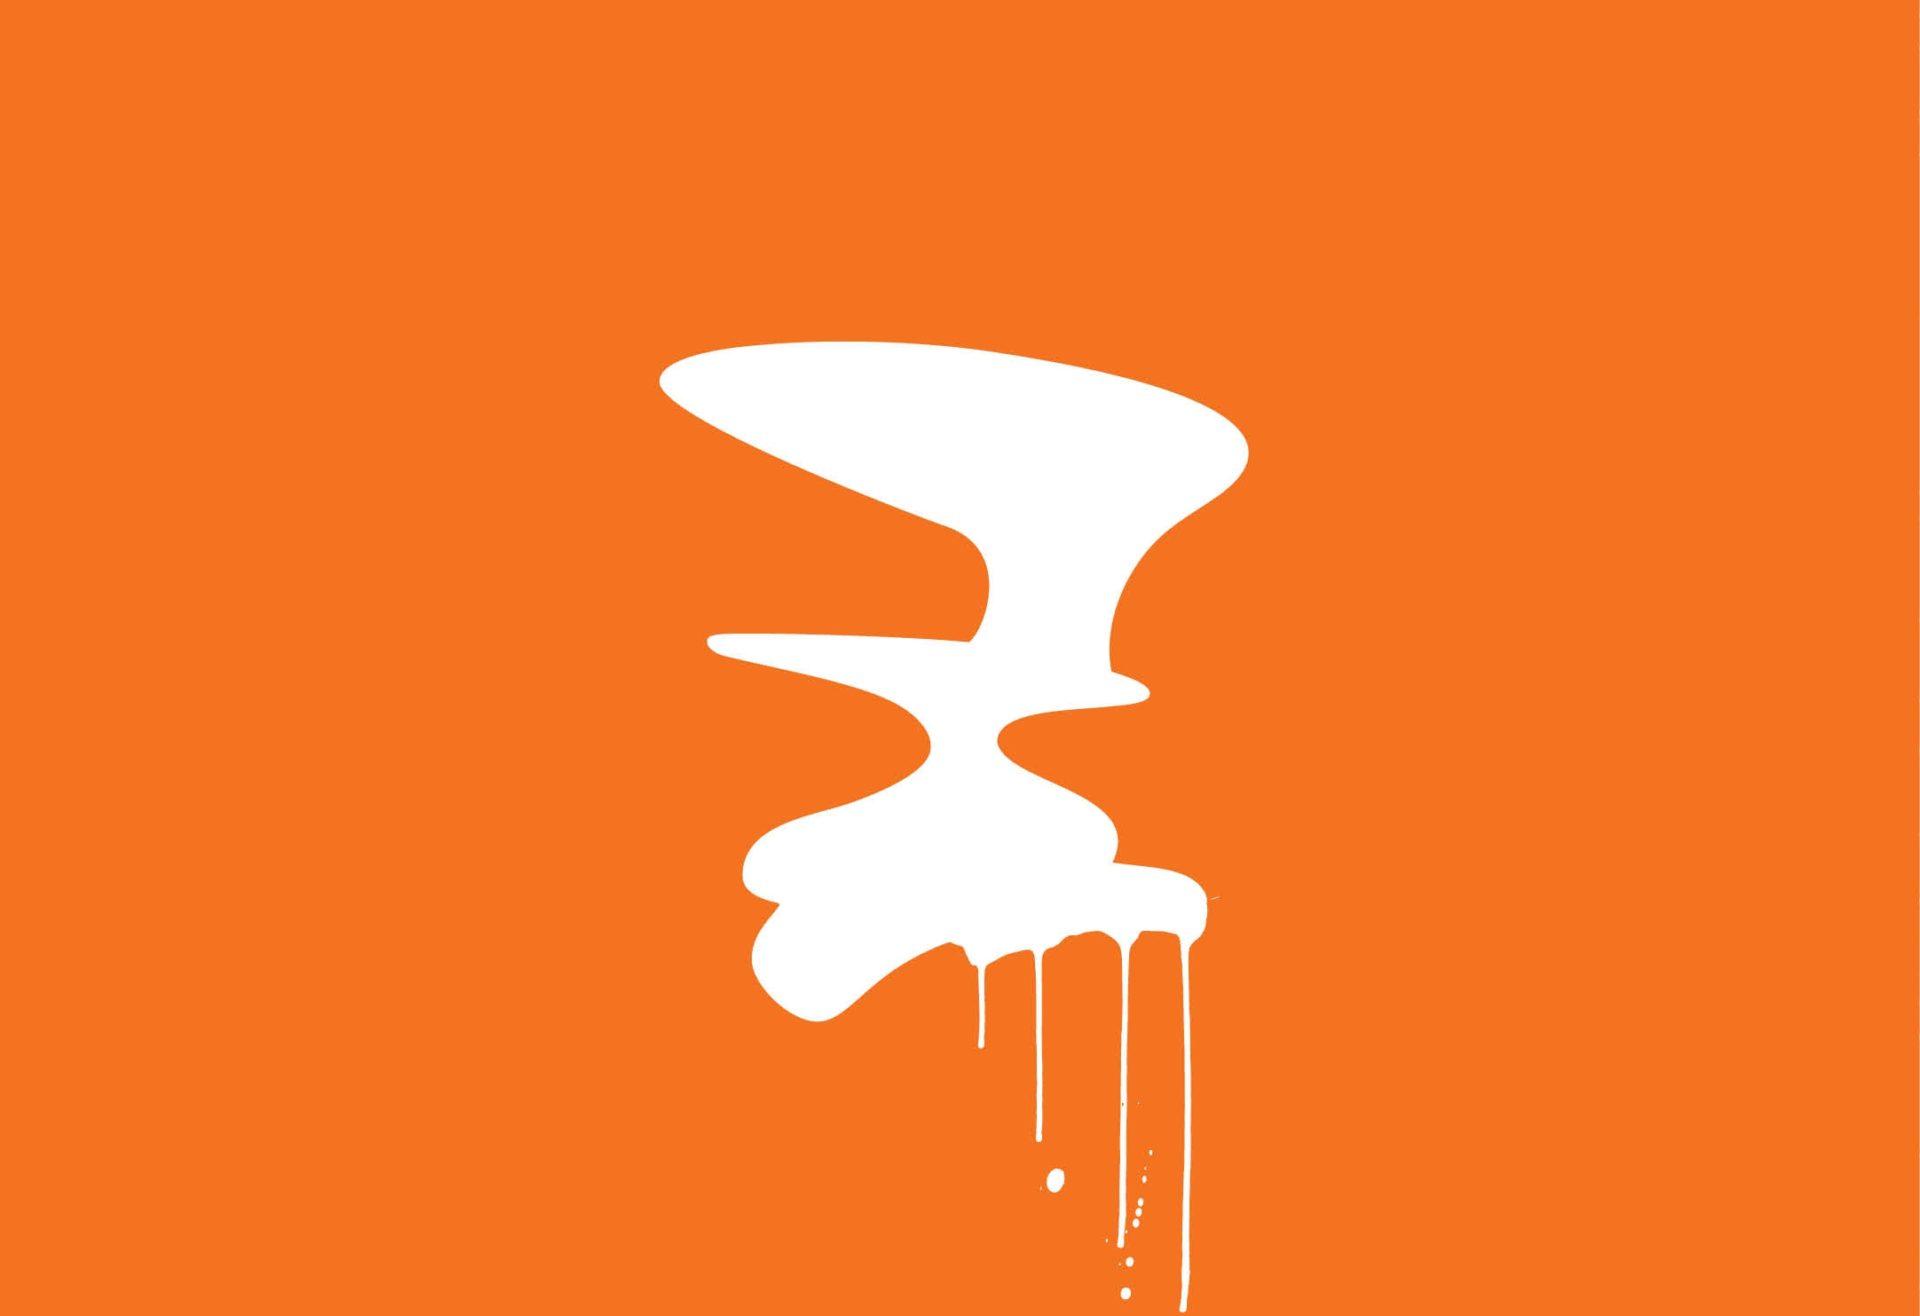 Artprize - Peopledesign